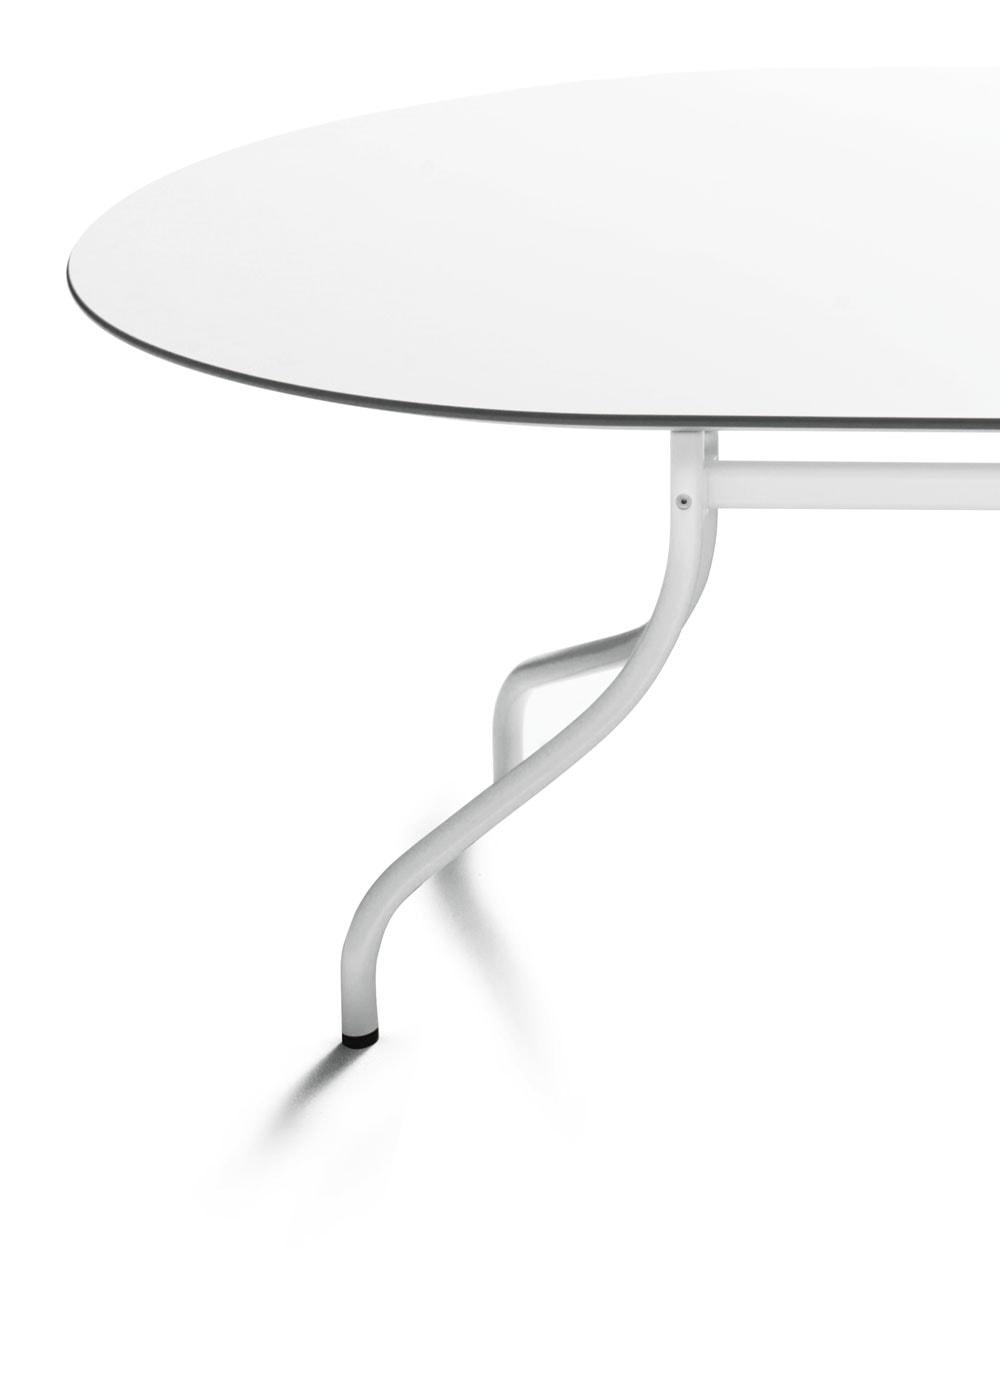 20160407-2394-depadova-tavoli-shine-intro.jpg